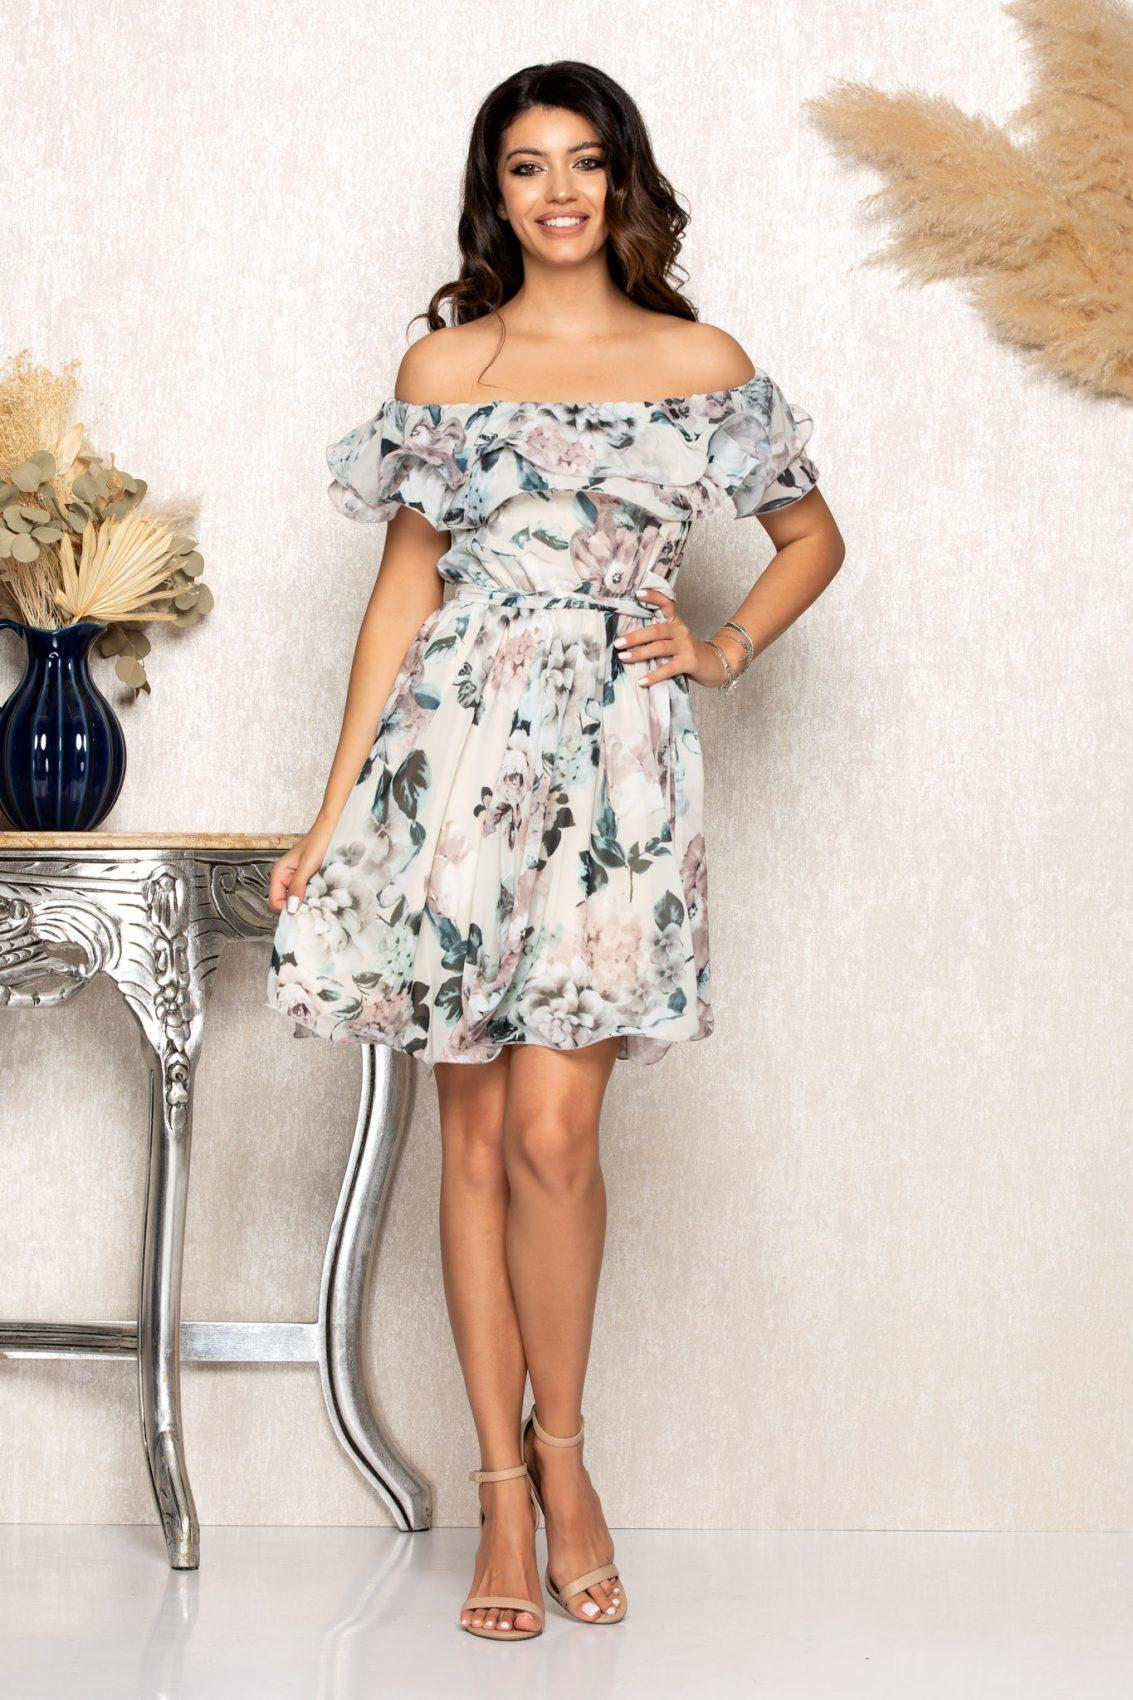 Nude Φλοράλ Φόρεμα Beatrice B117 1